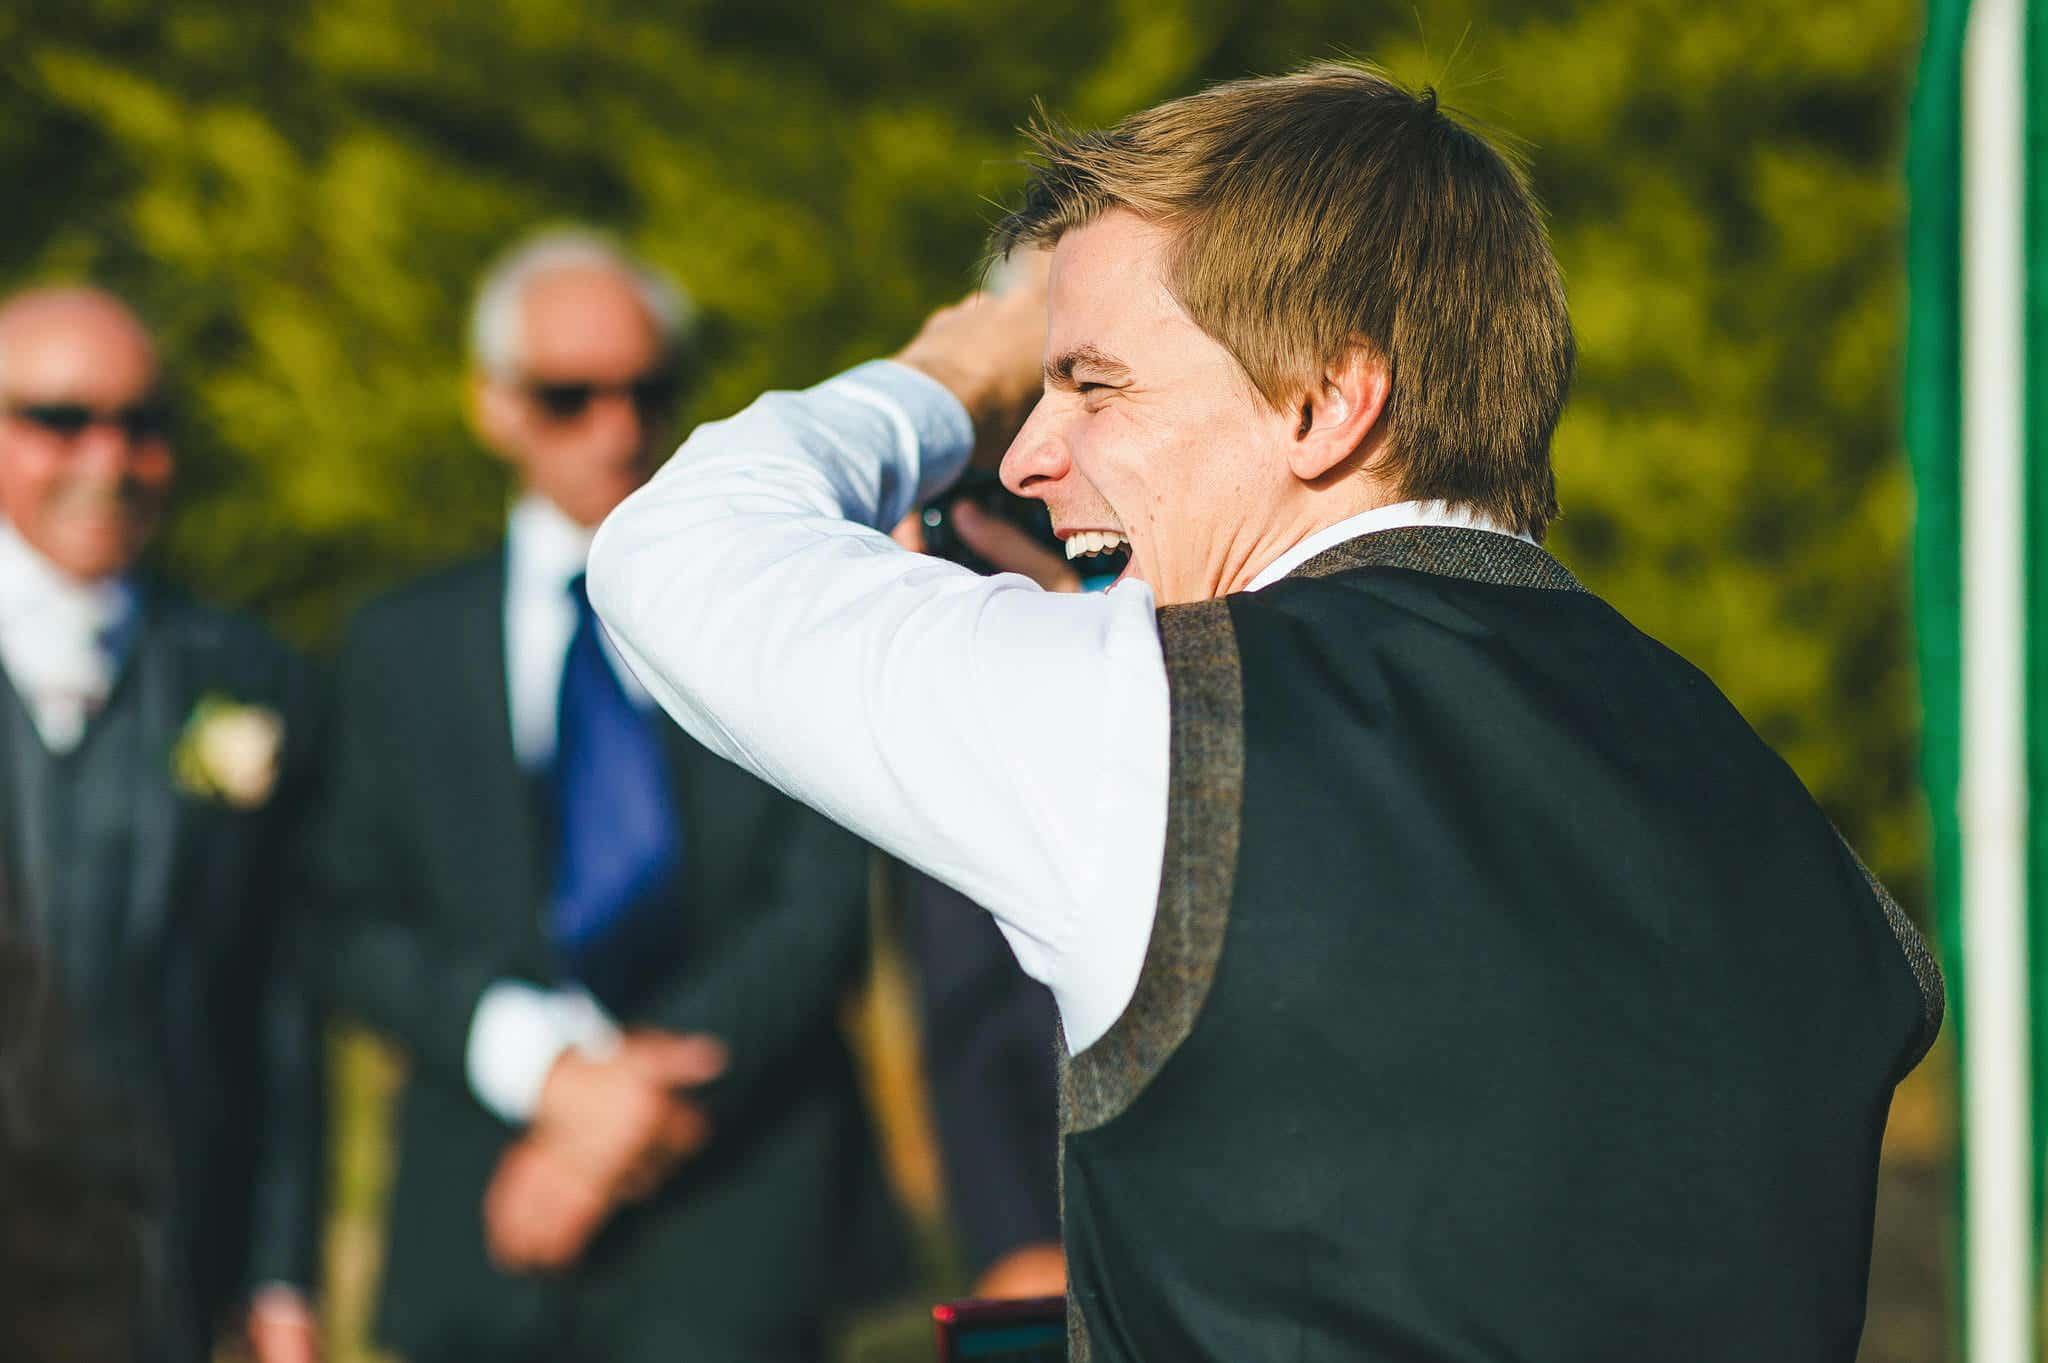 wedding photography midlands 46 - Midlands wedding photography - 2015 Review